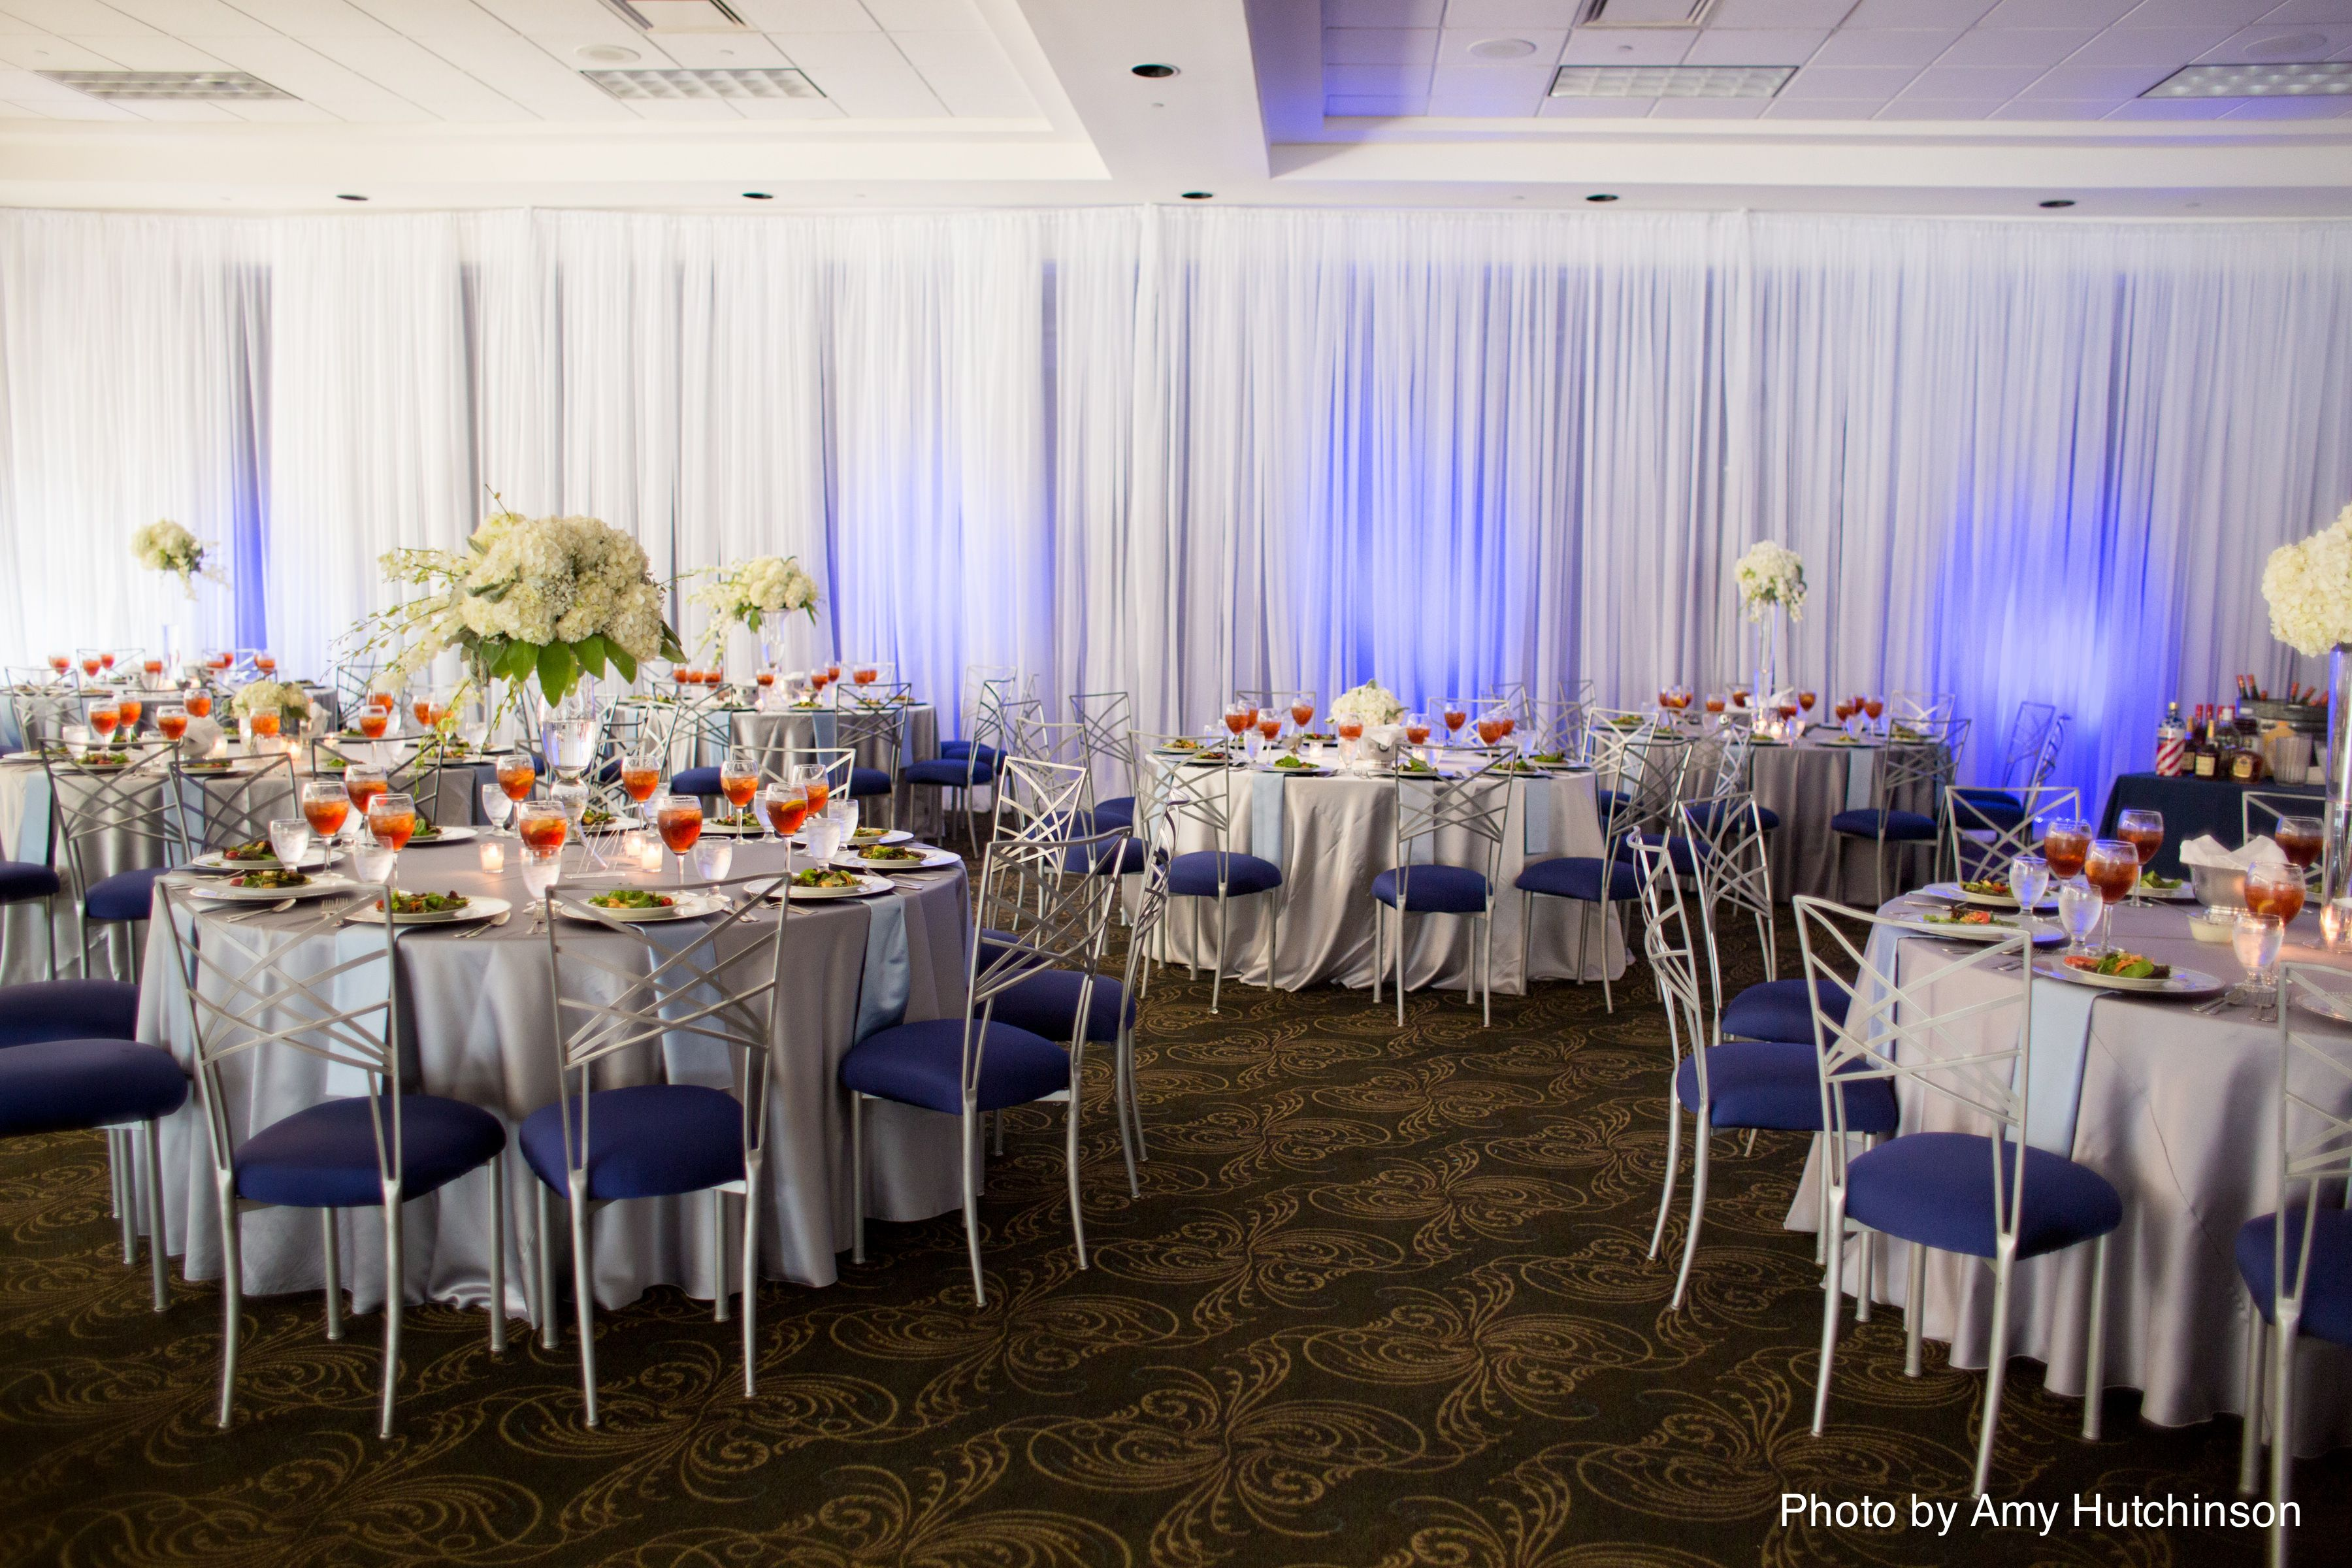 Blue Weddings Southern African American Wedding Planner Designer Hydrangea Centerpieces